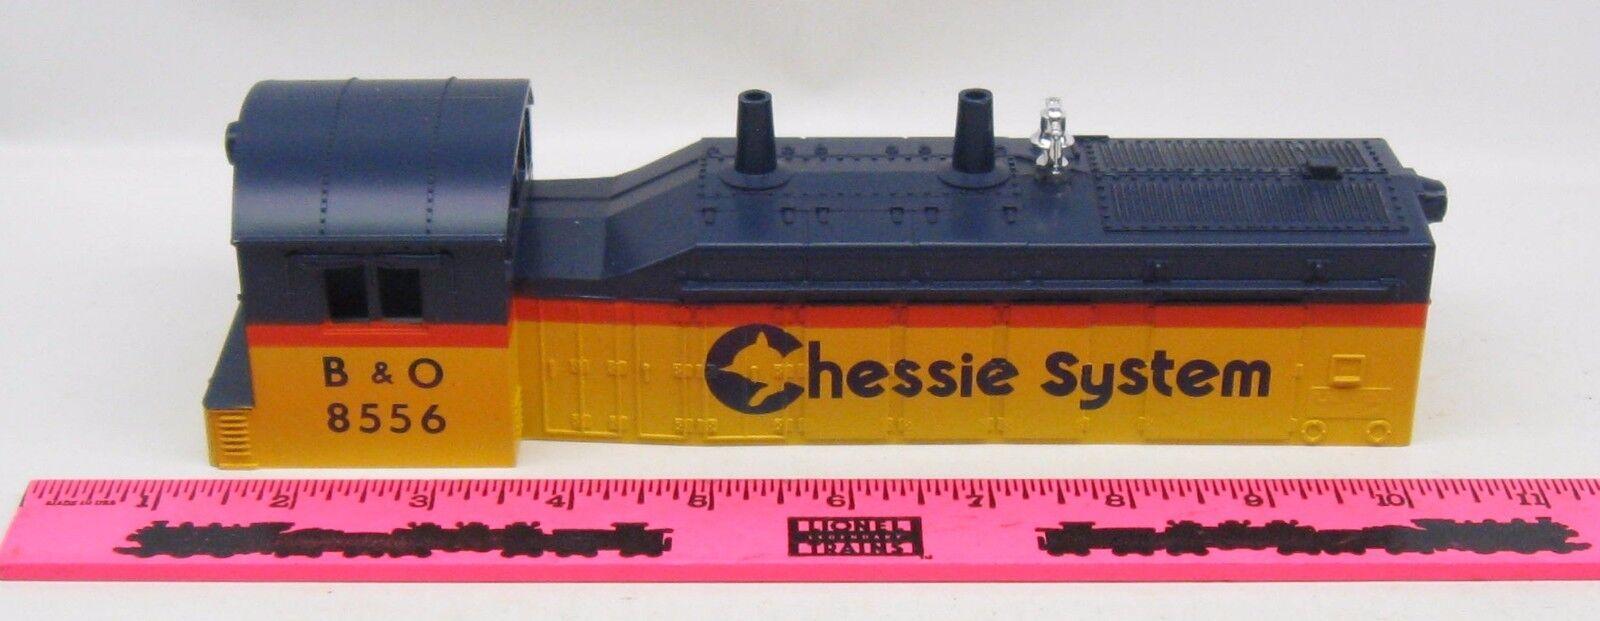 Lionel shell  8556 B&O Chessie System Diesel Shell